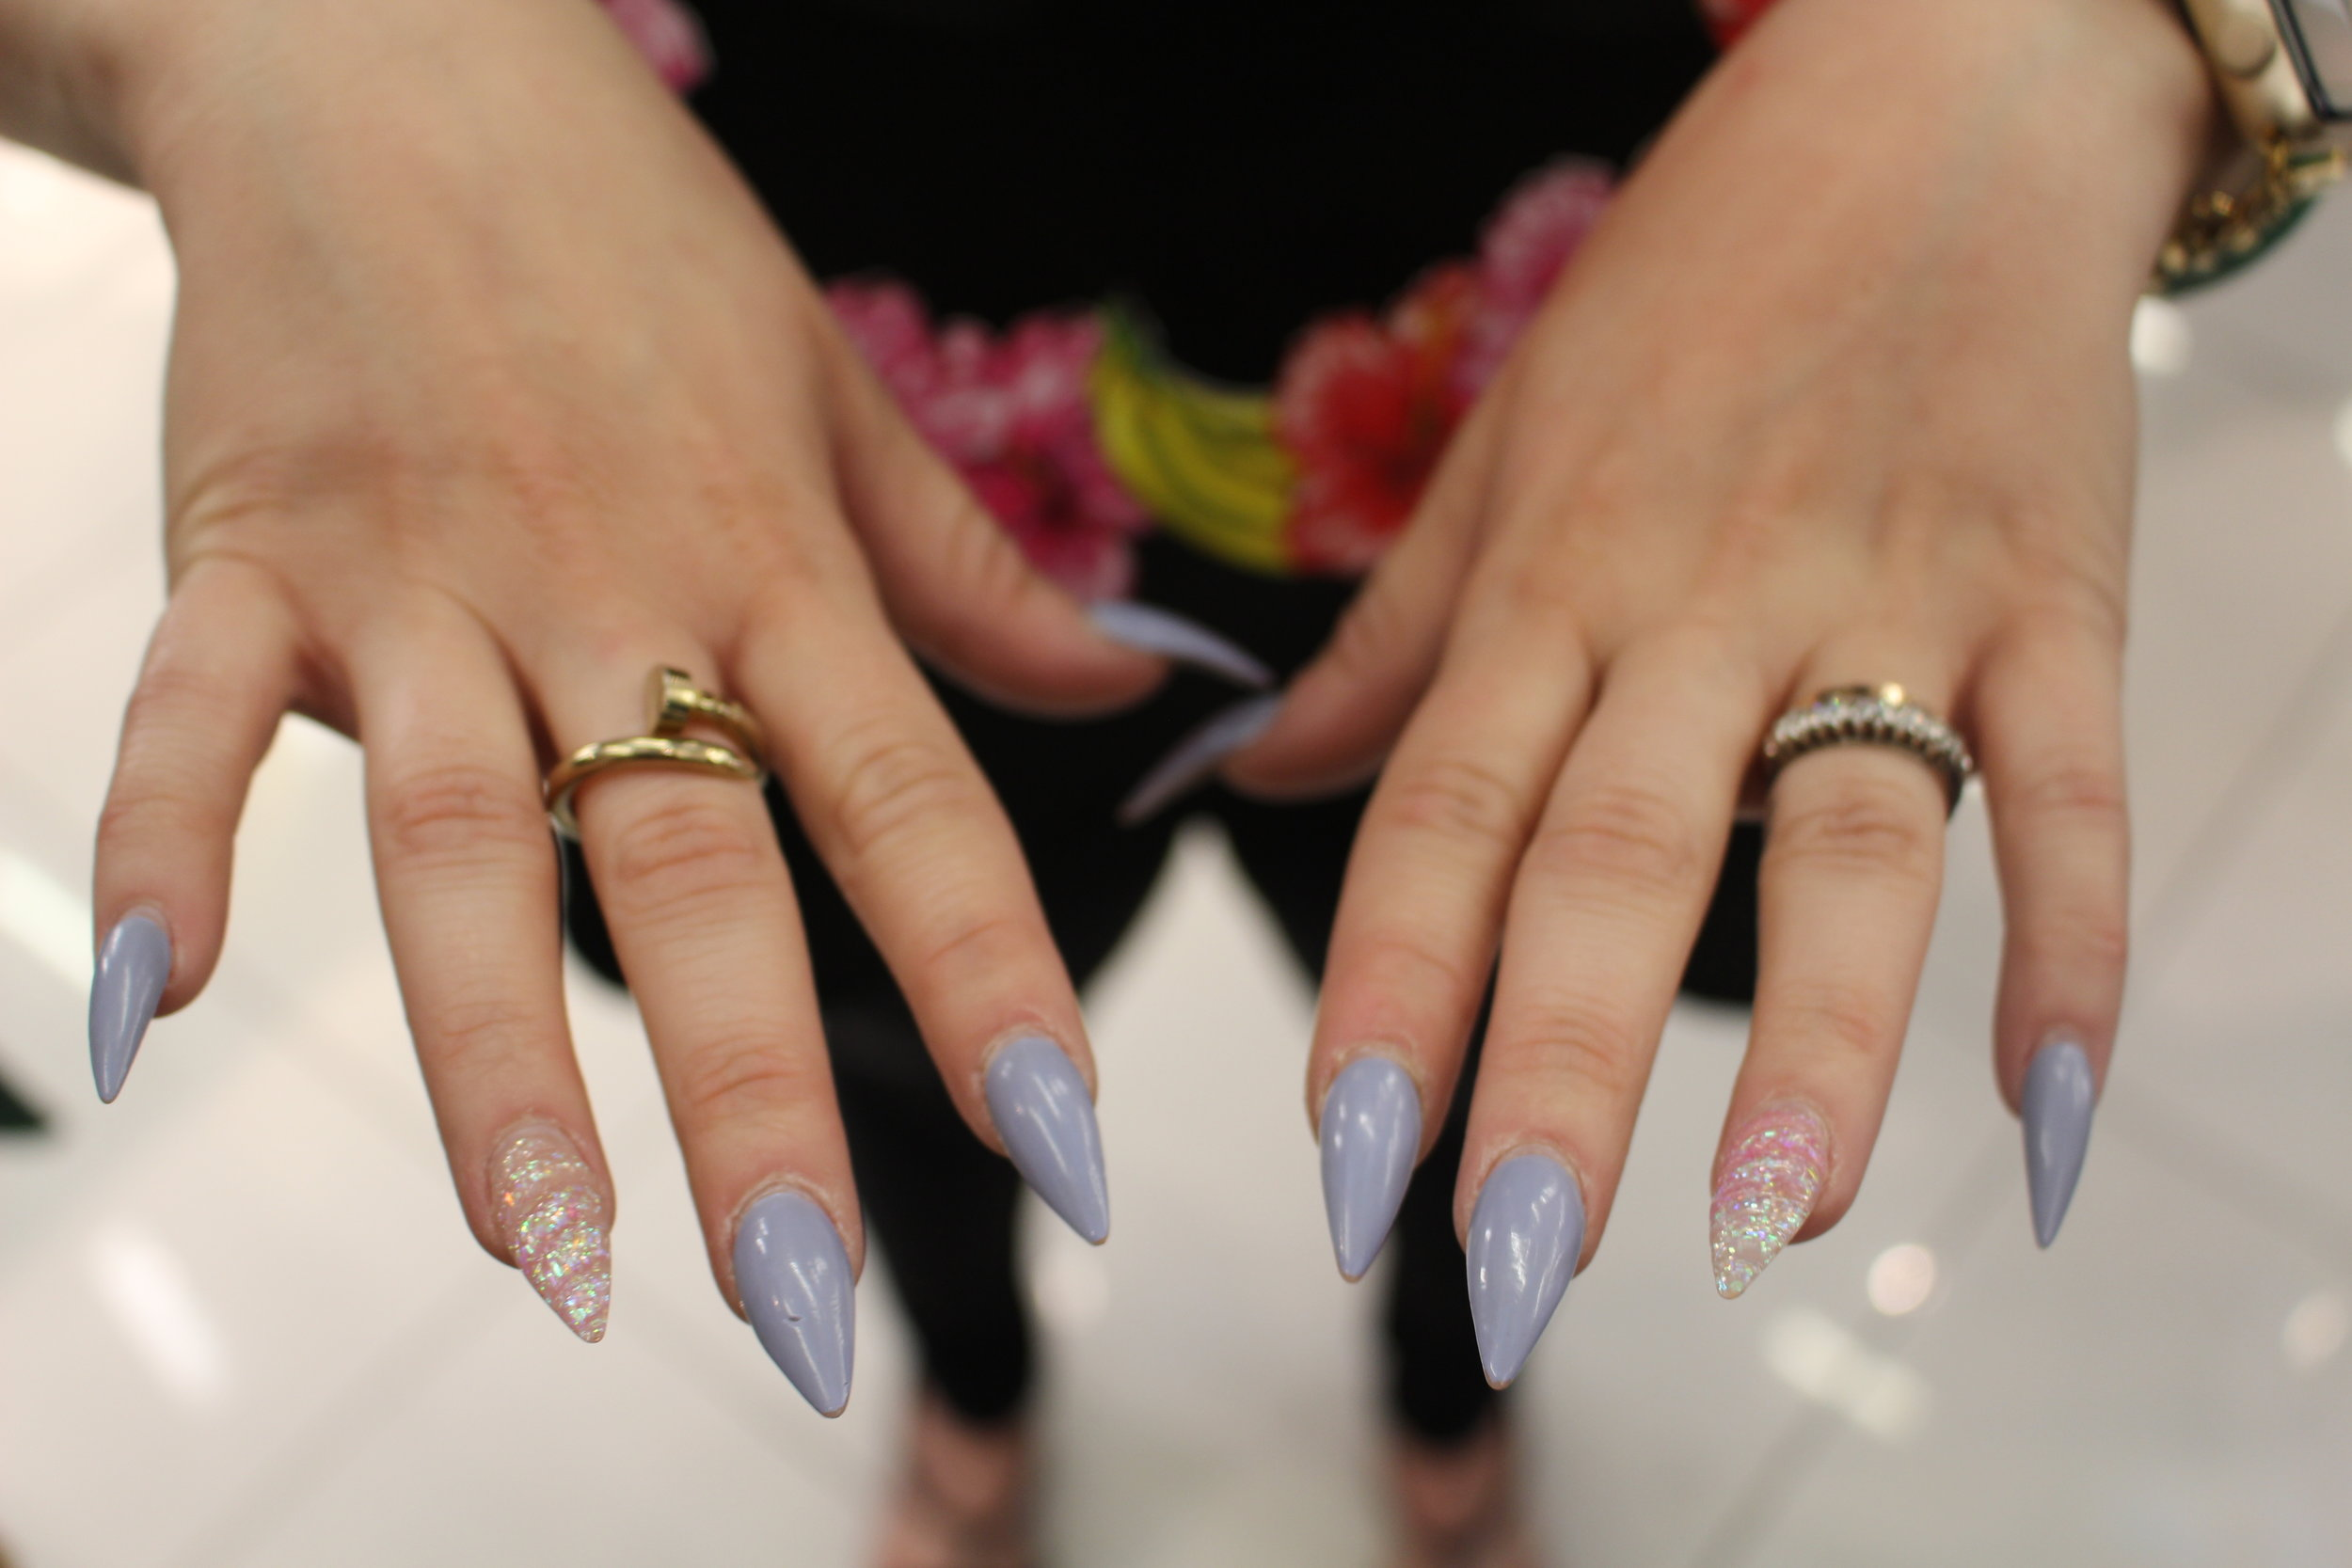 Unicorn nails on Marietta Castro were literally on point!